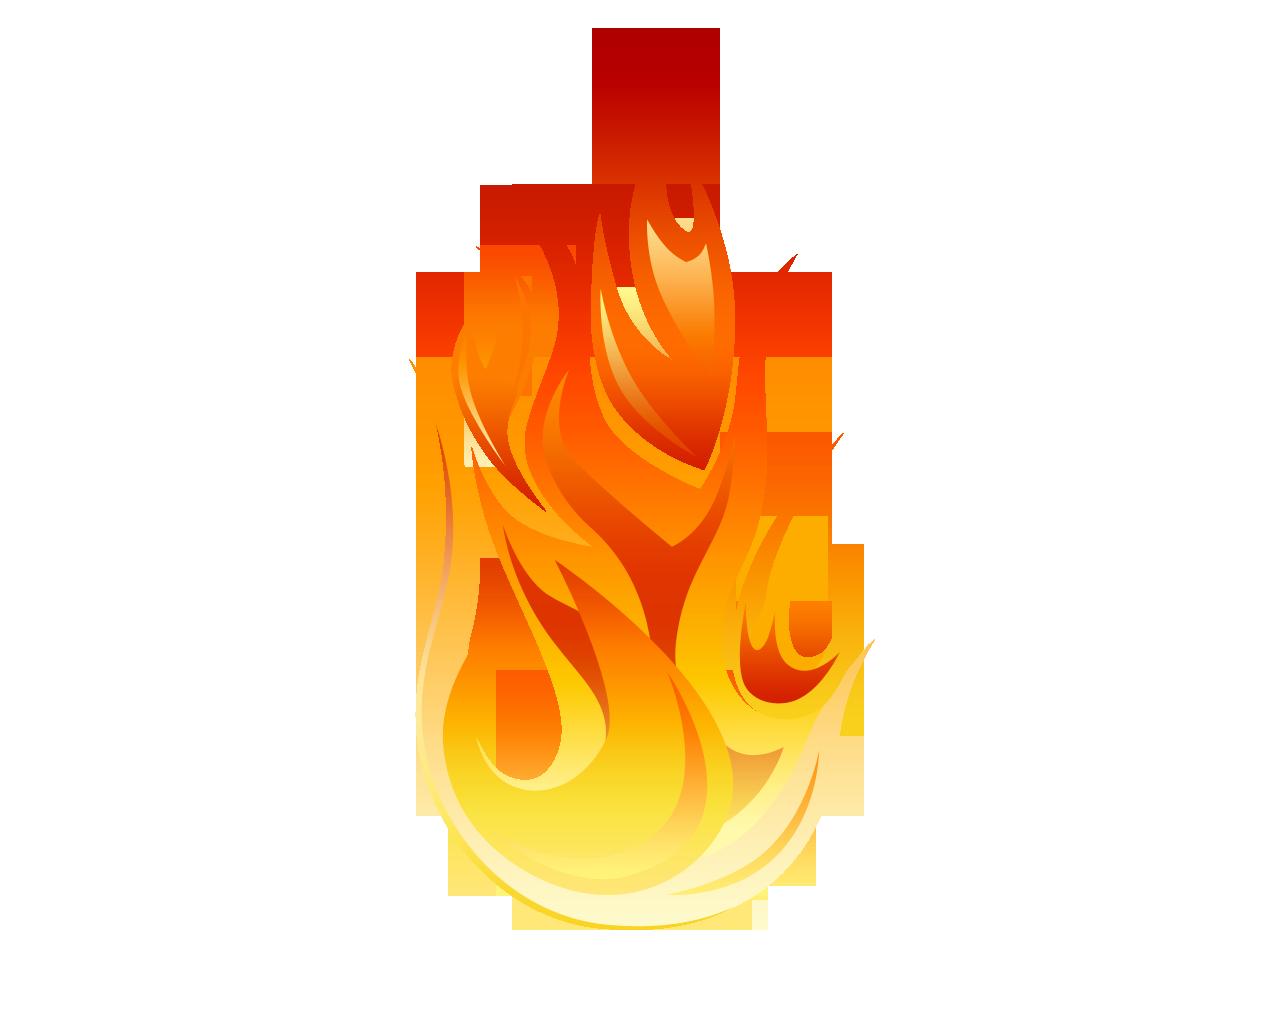 Transbordando png fogo the. Flames clipart pentecost flame